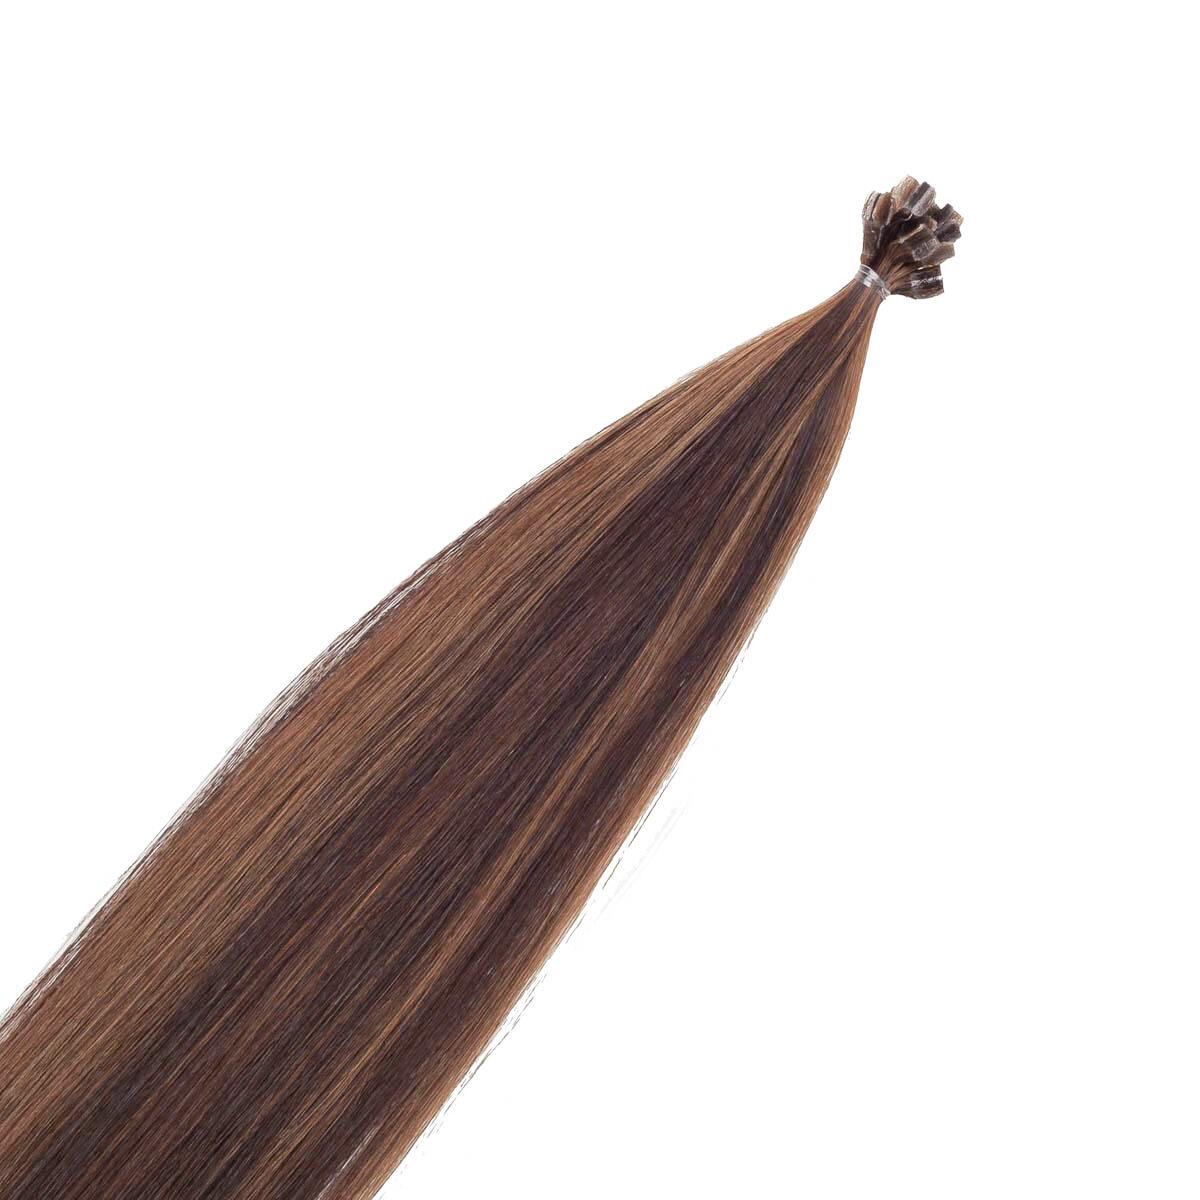 Nail Hair Original M2.3/5.0 Chocolate Mix 50 cm